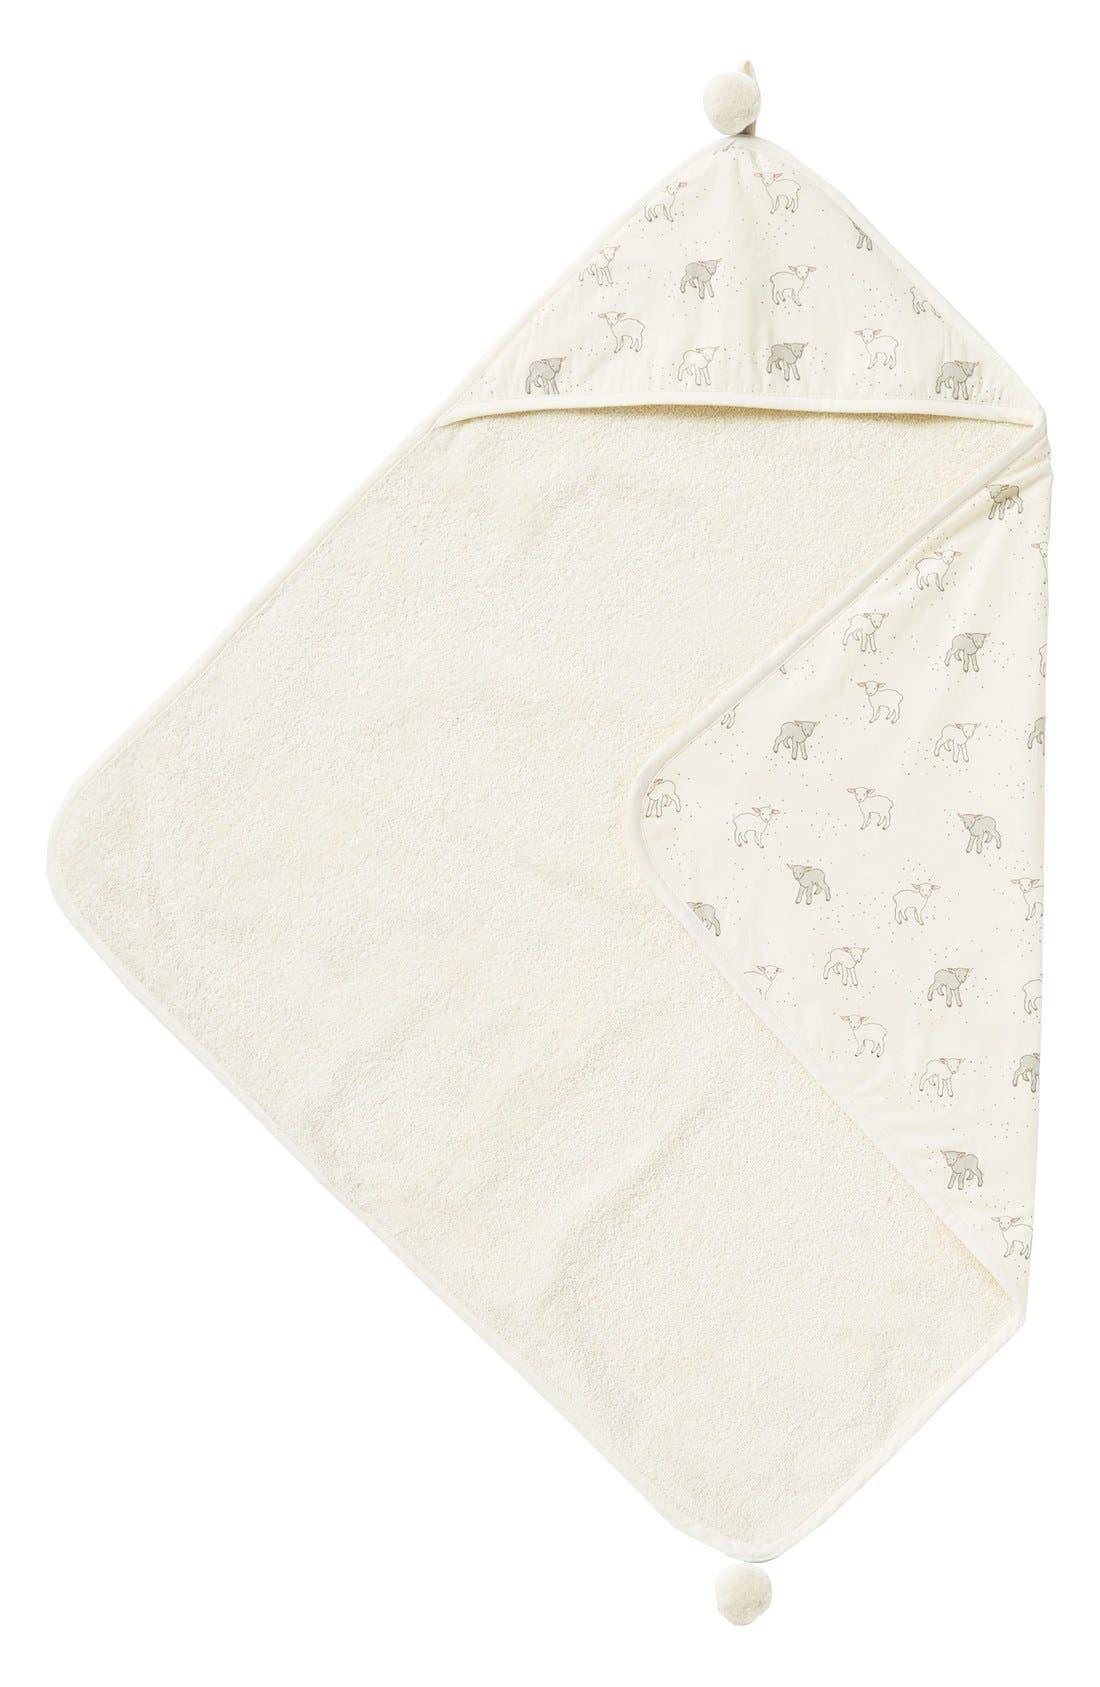 Alternate Image 1 Selected - Petit Pehr 'Little Lamb' Print Hooded Towel (Baby)